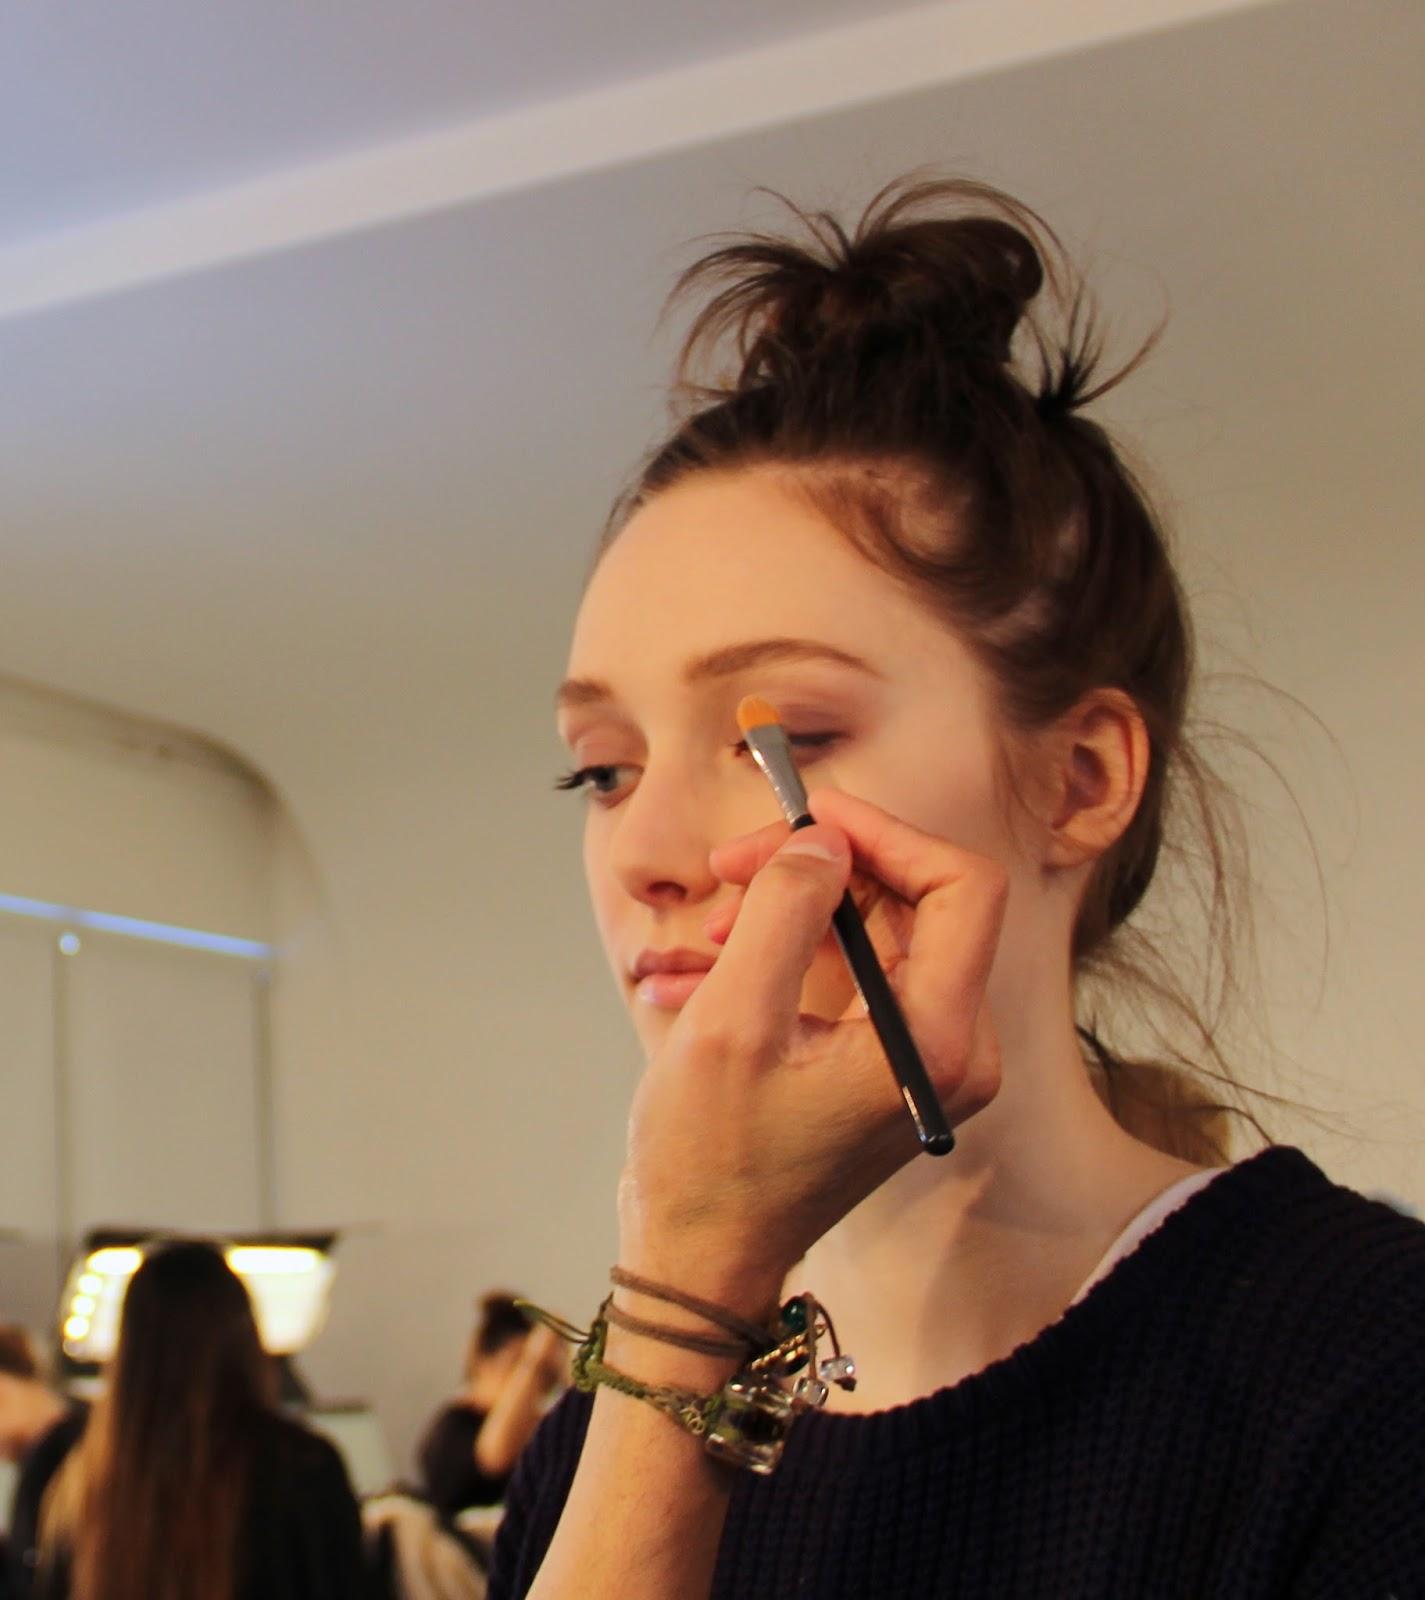 Beauty & Health Eyebrow Enhancers 3 Colors Beauty Eyebrow Enhancer Professional Eye Brow Makeup Eyebrow Powder Eye Shadow Eyebrow Make Up Palette New 2018 Quell Summer Thirst